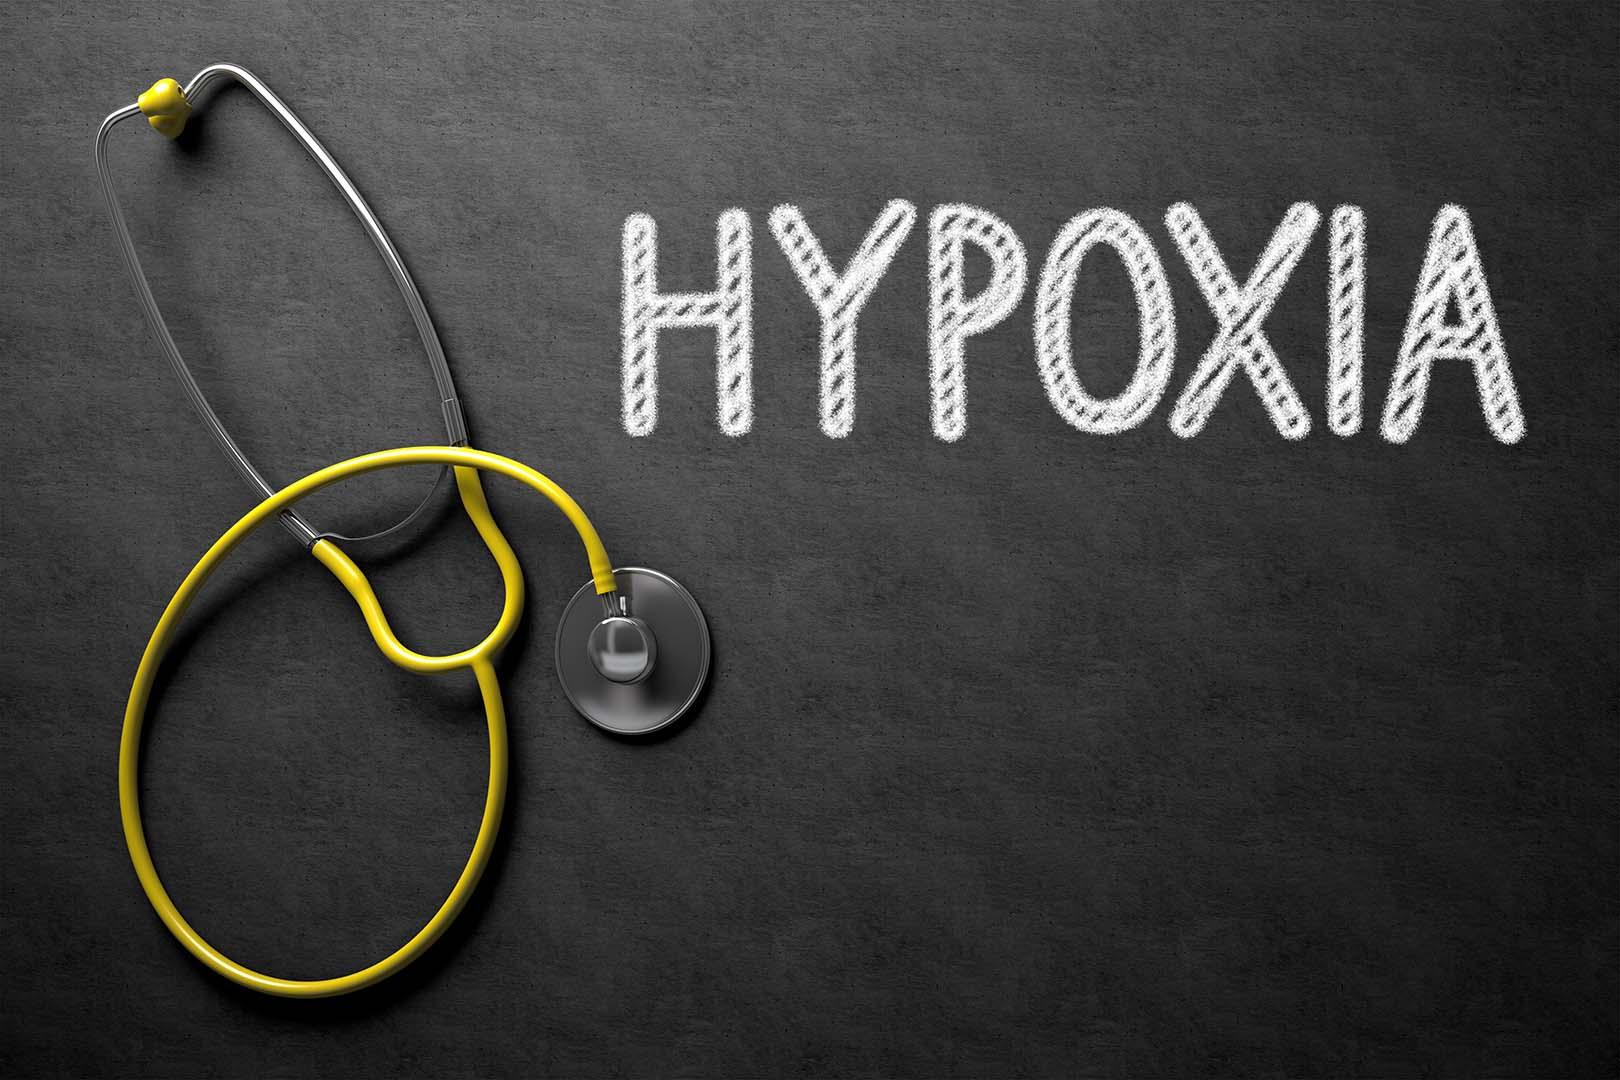 Hipoksia